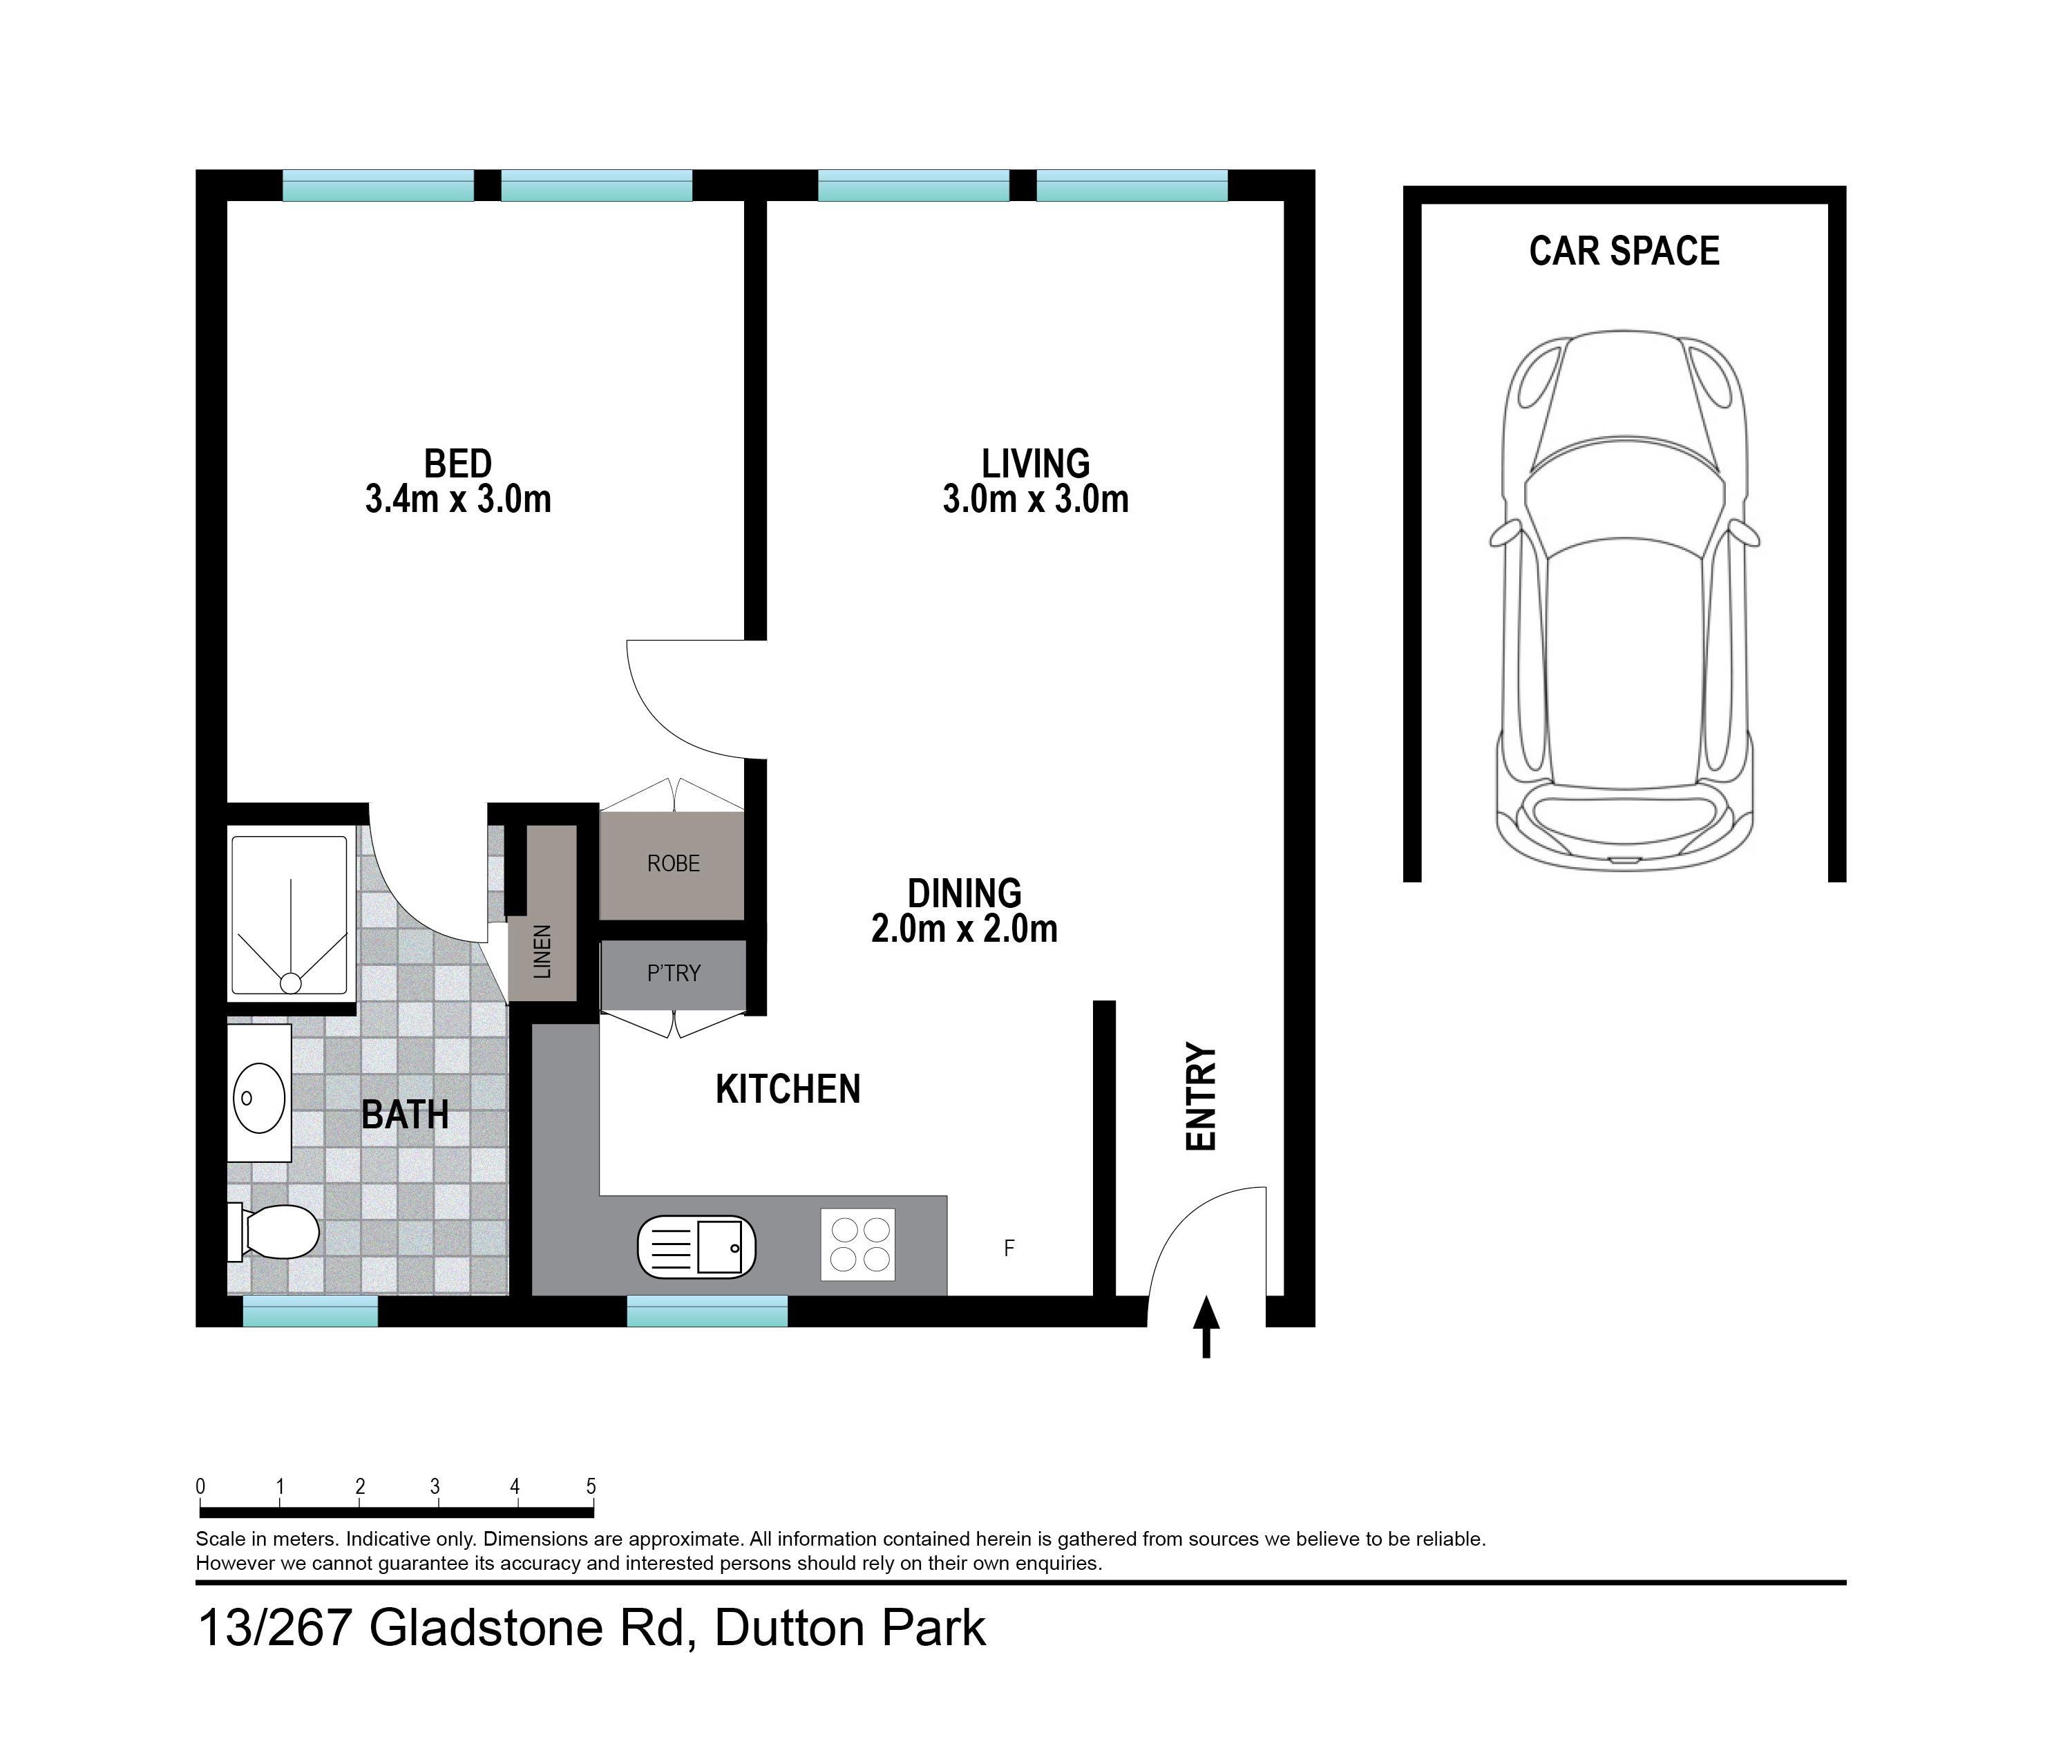 13/267 Gladstone Road Floor plan